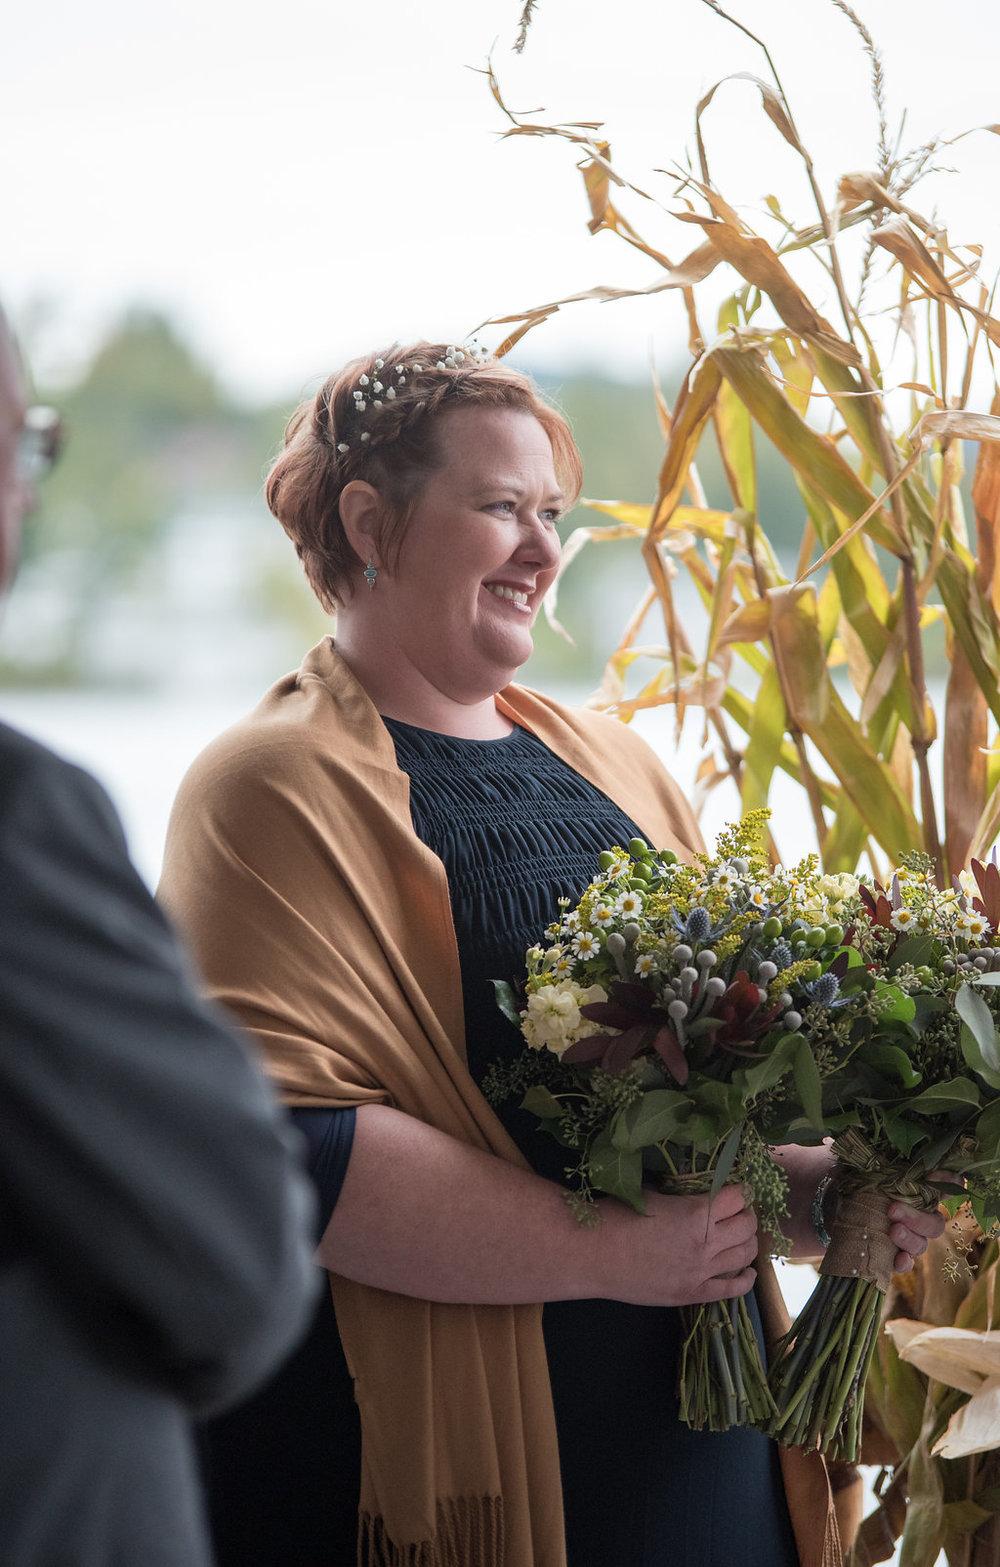 brides-maid-golden-arrow-lakeside-resort-lake-placid-ny-wedding-ym-photography